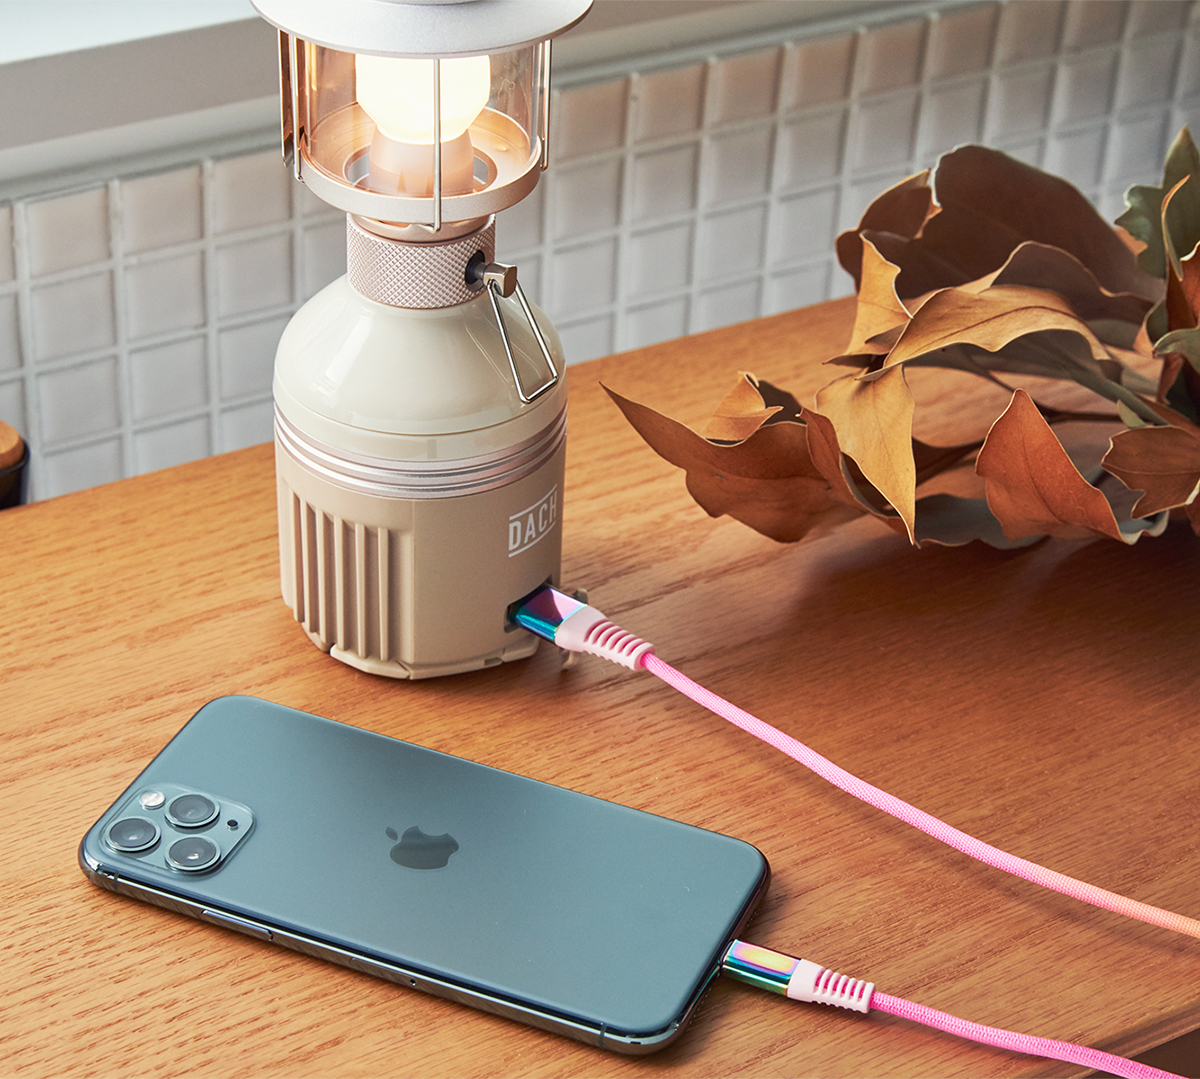 iPhoneが約4回充電できる、7WAY多機能ランタン | LUNAR